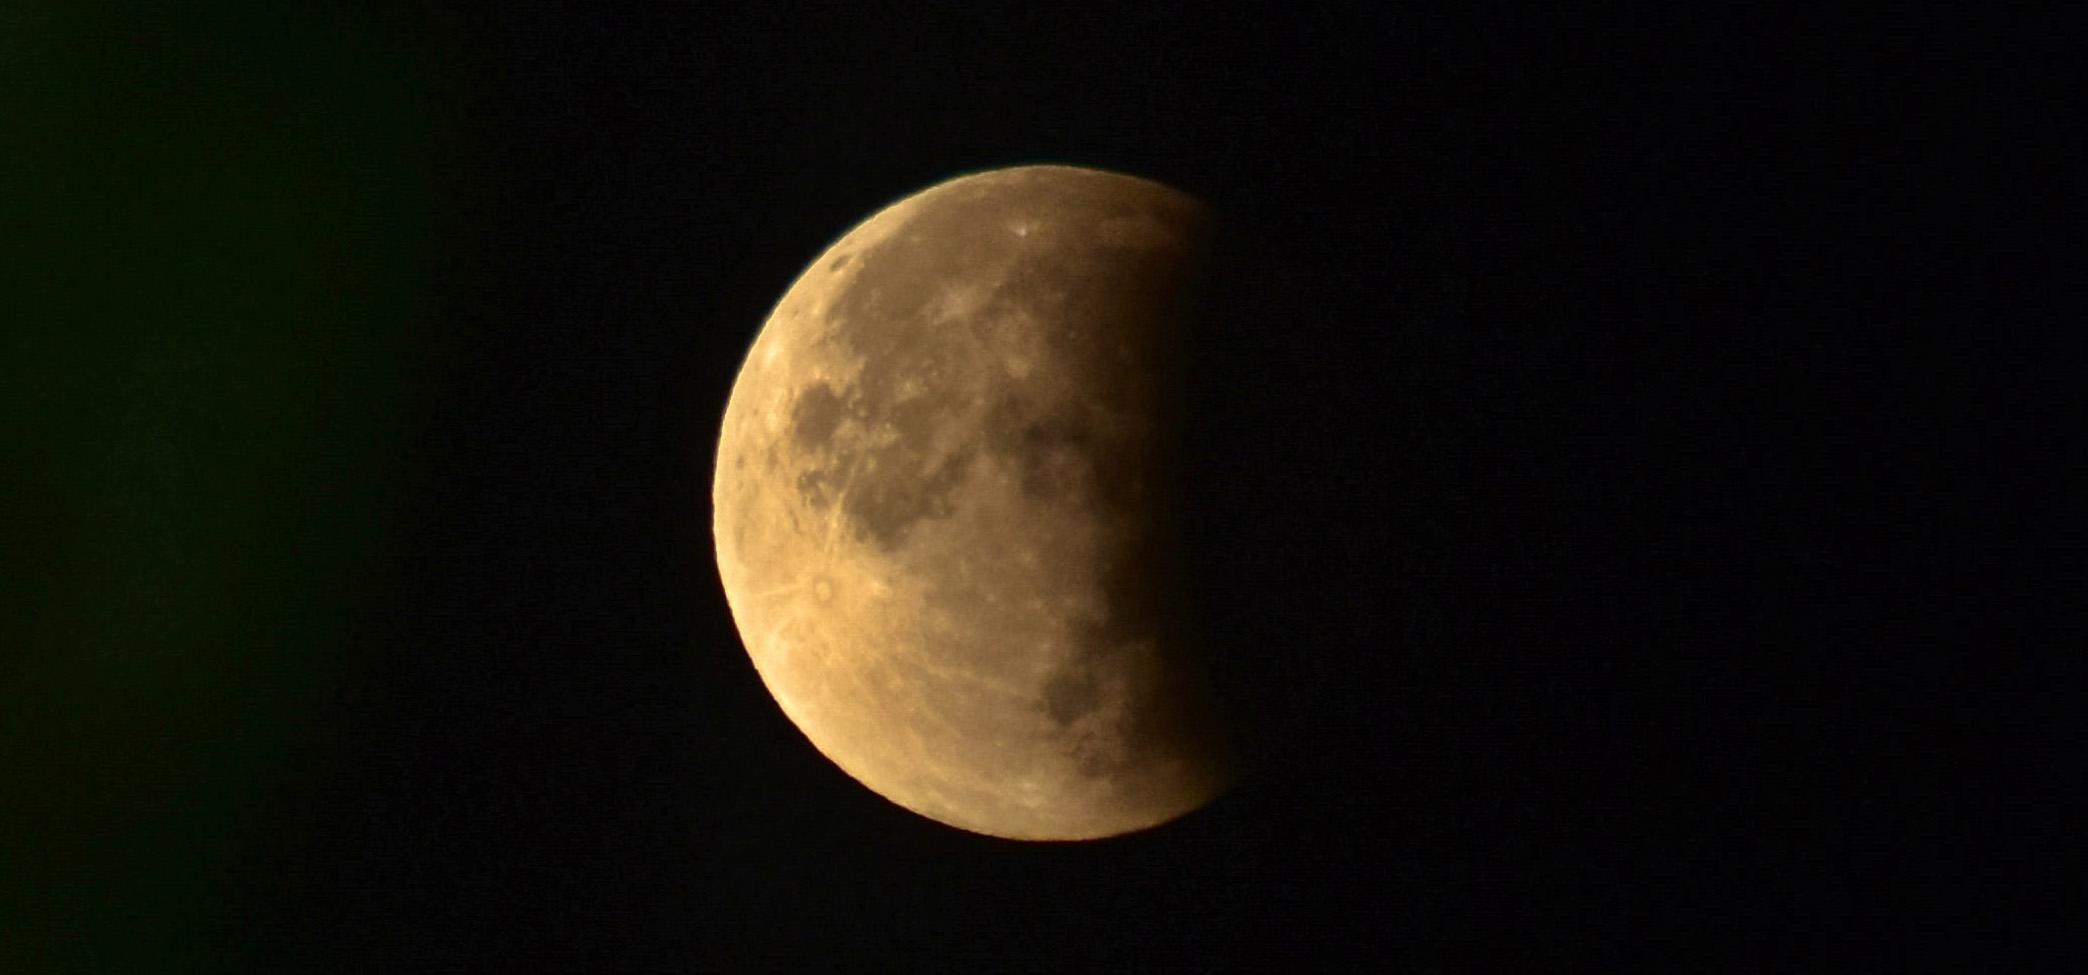 The Last Lunar Eclipse of 2019 Showed an Orange-Hued Full Moon in